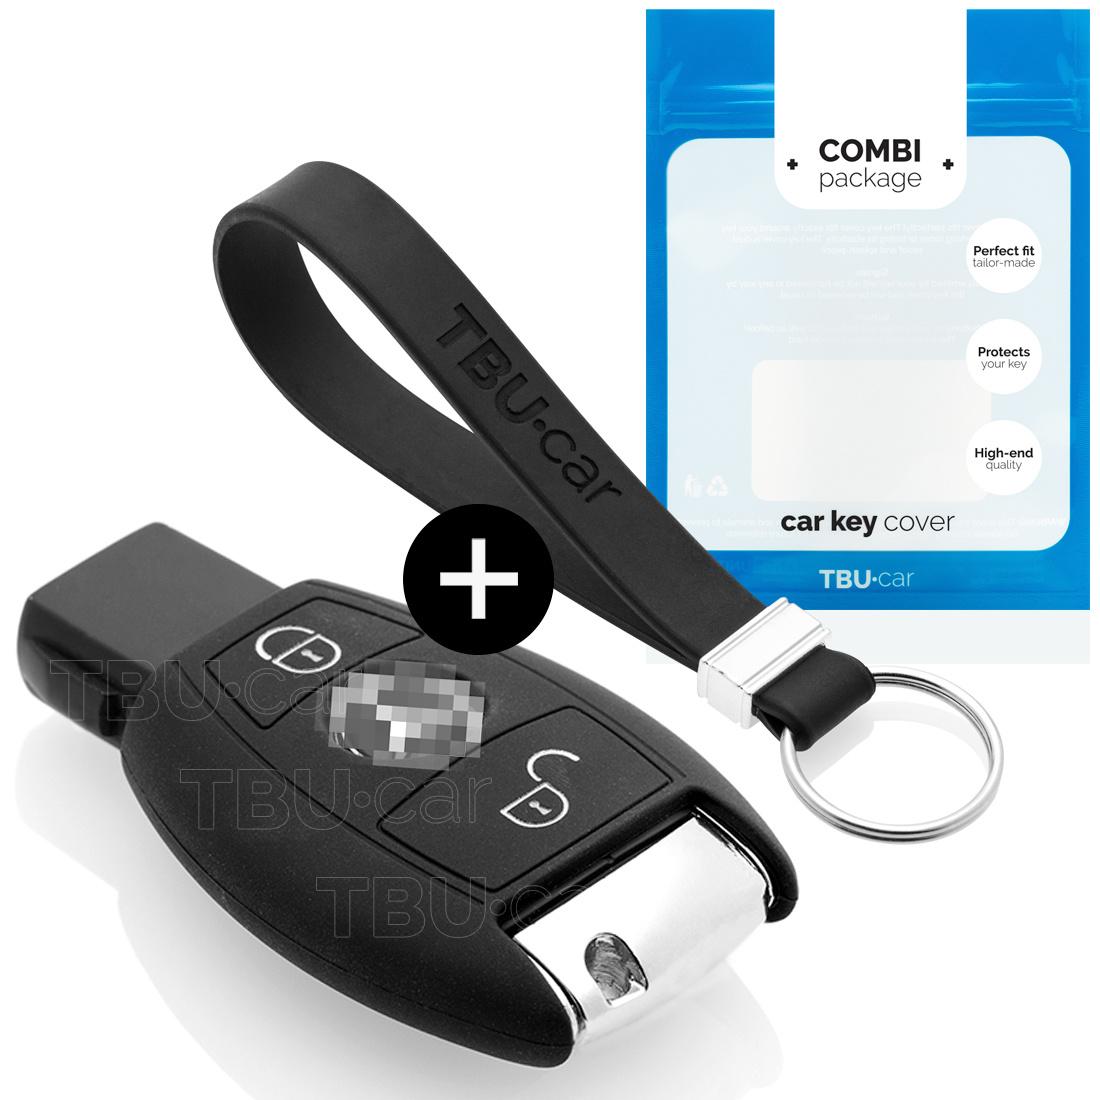 TBU car TBU car Sleutel cover compatibel met Mercedes - Silicone sleutelhoesje - beschermhoesje autosleutel - Zwart